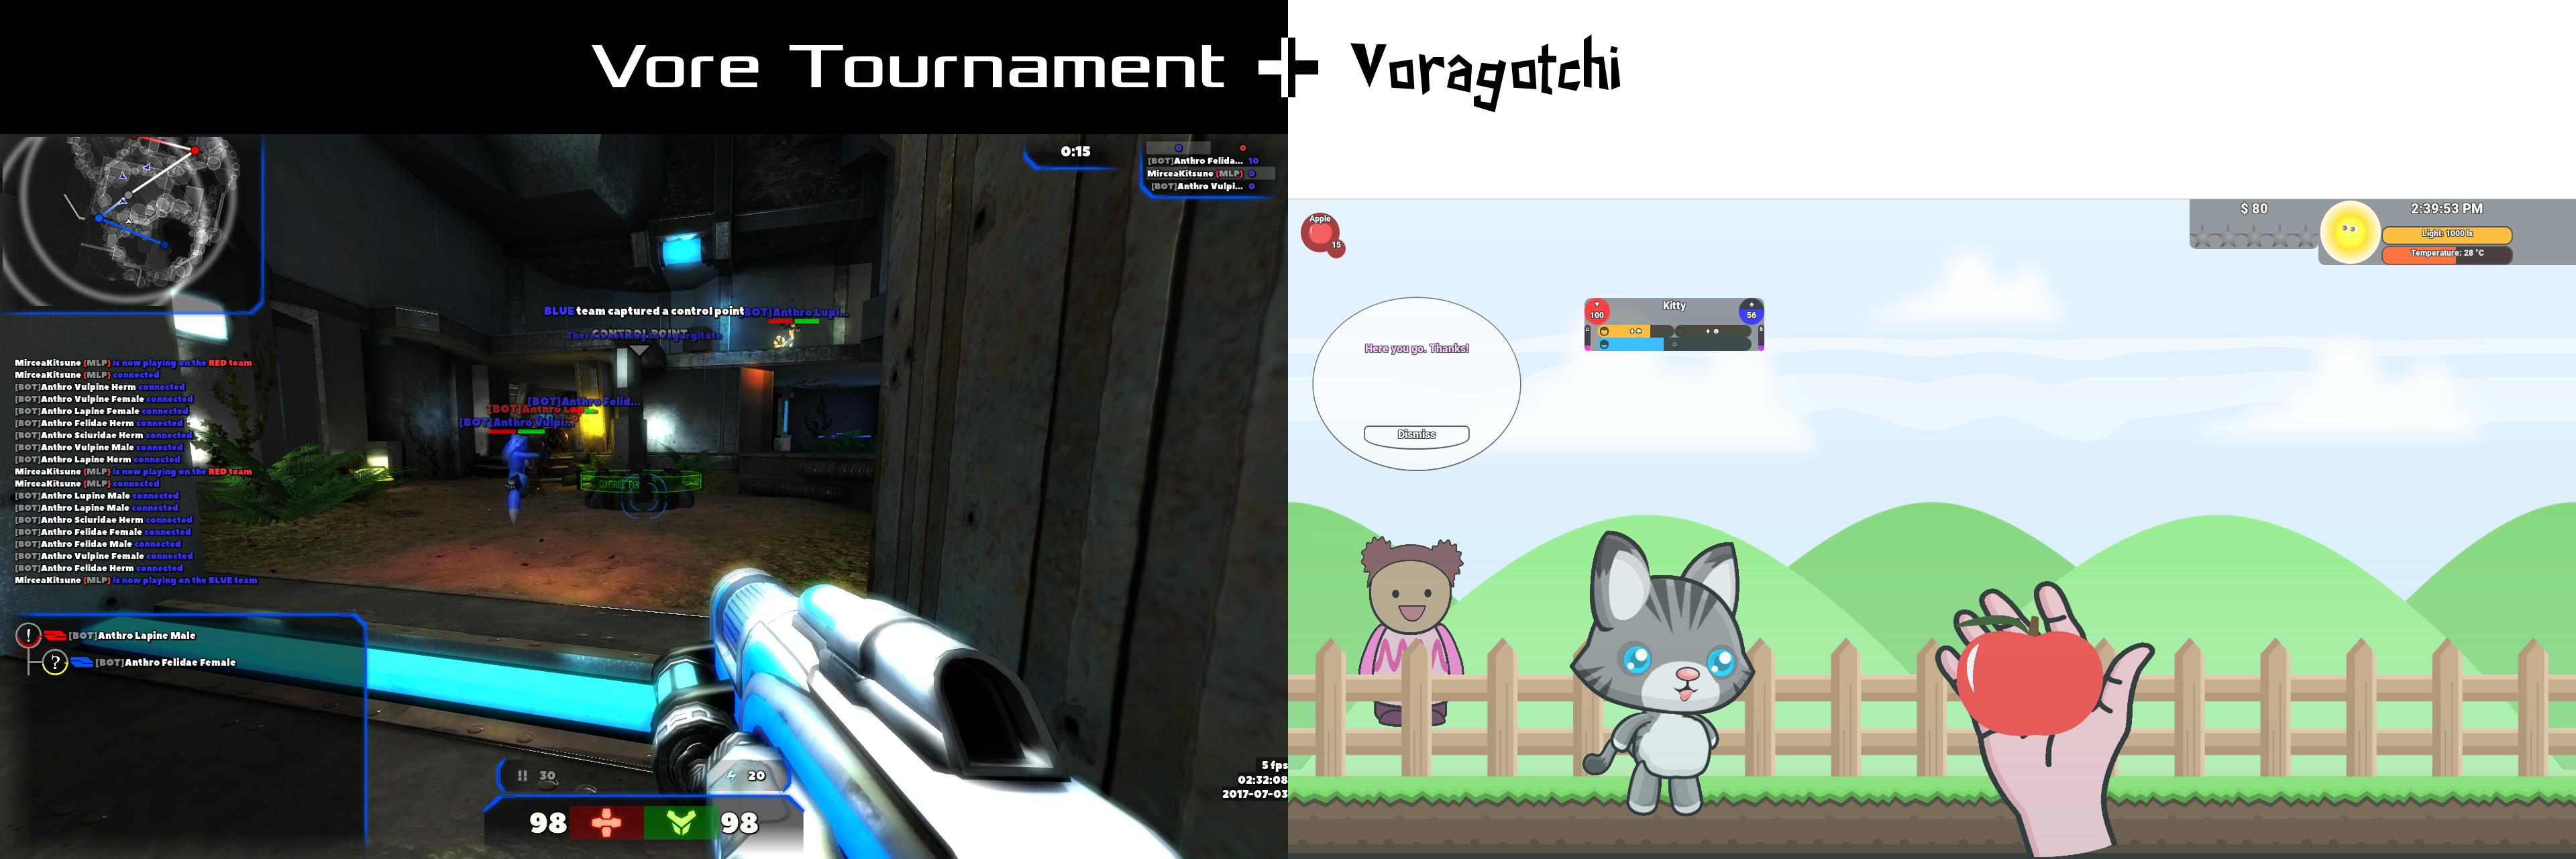 Download Vore Games: Vore Tournament & Voragotchi